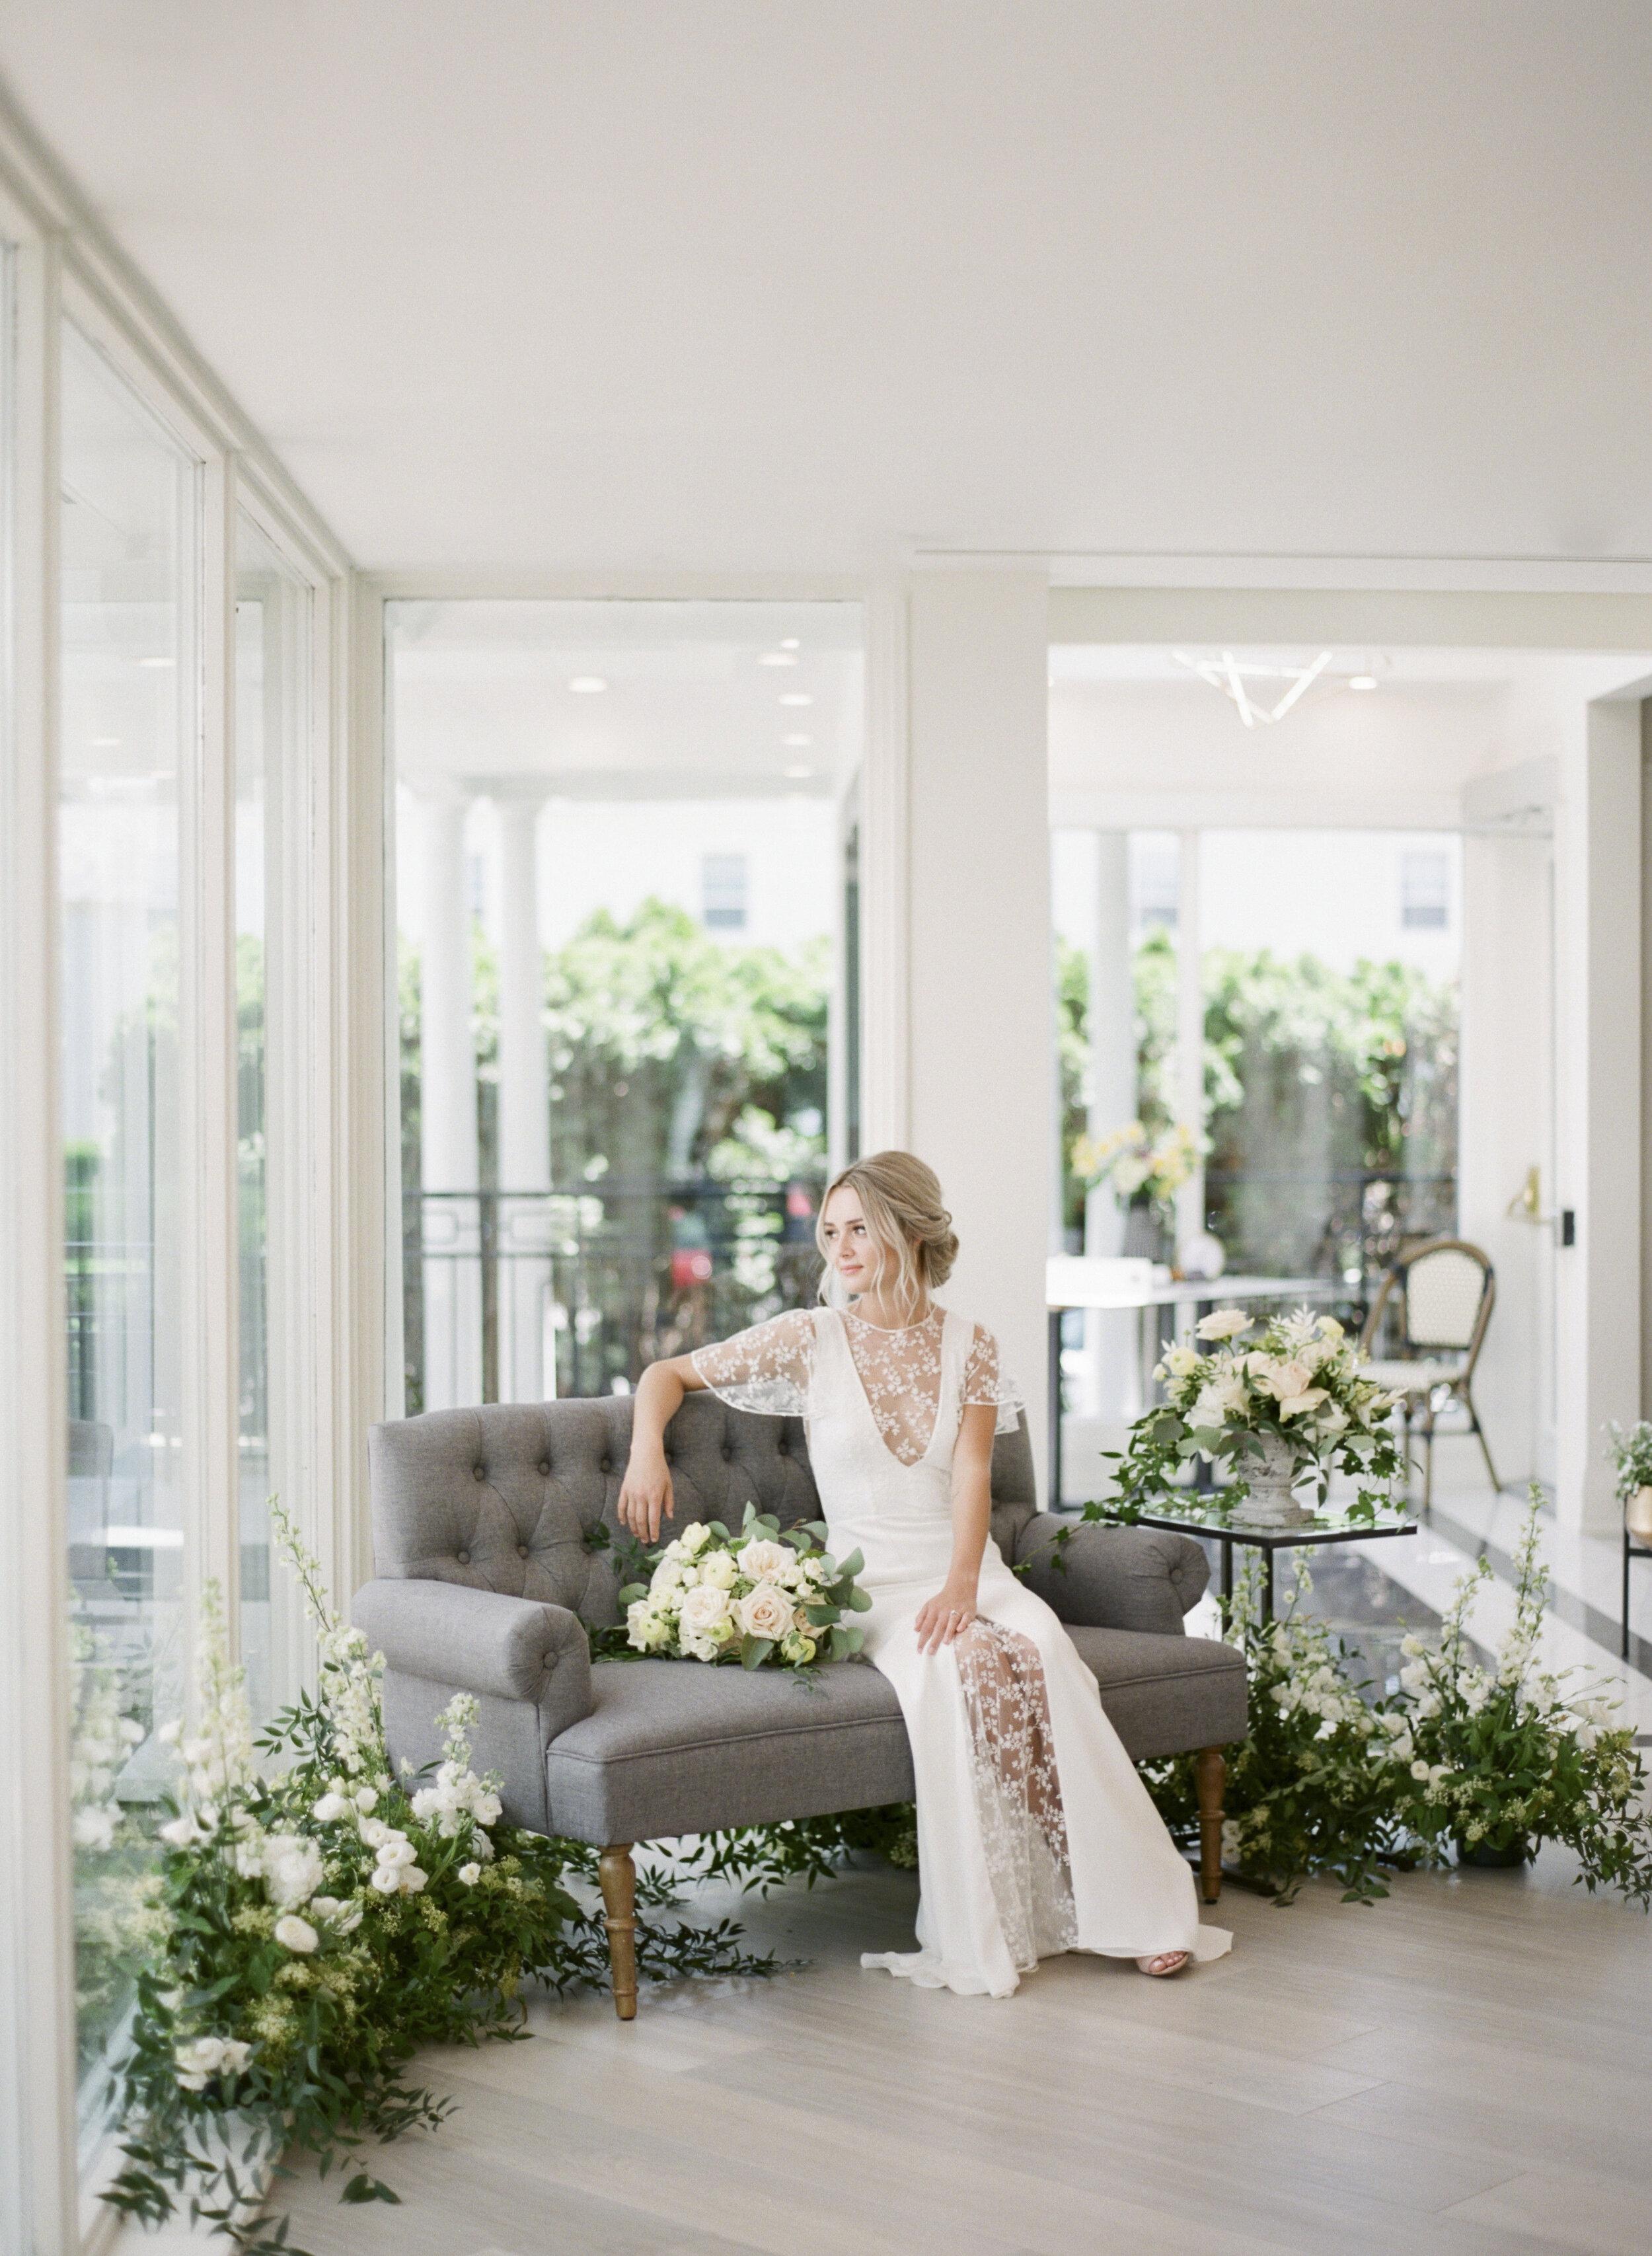 vineyard-bride-vendor-spotlight-the-swish-list-bridal-glam-co-hair-and-makeup-wedding-vendors-niagara-toronto-southern-ontario007.jpg